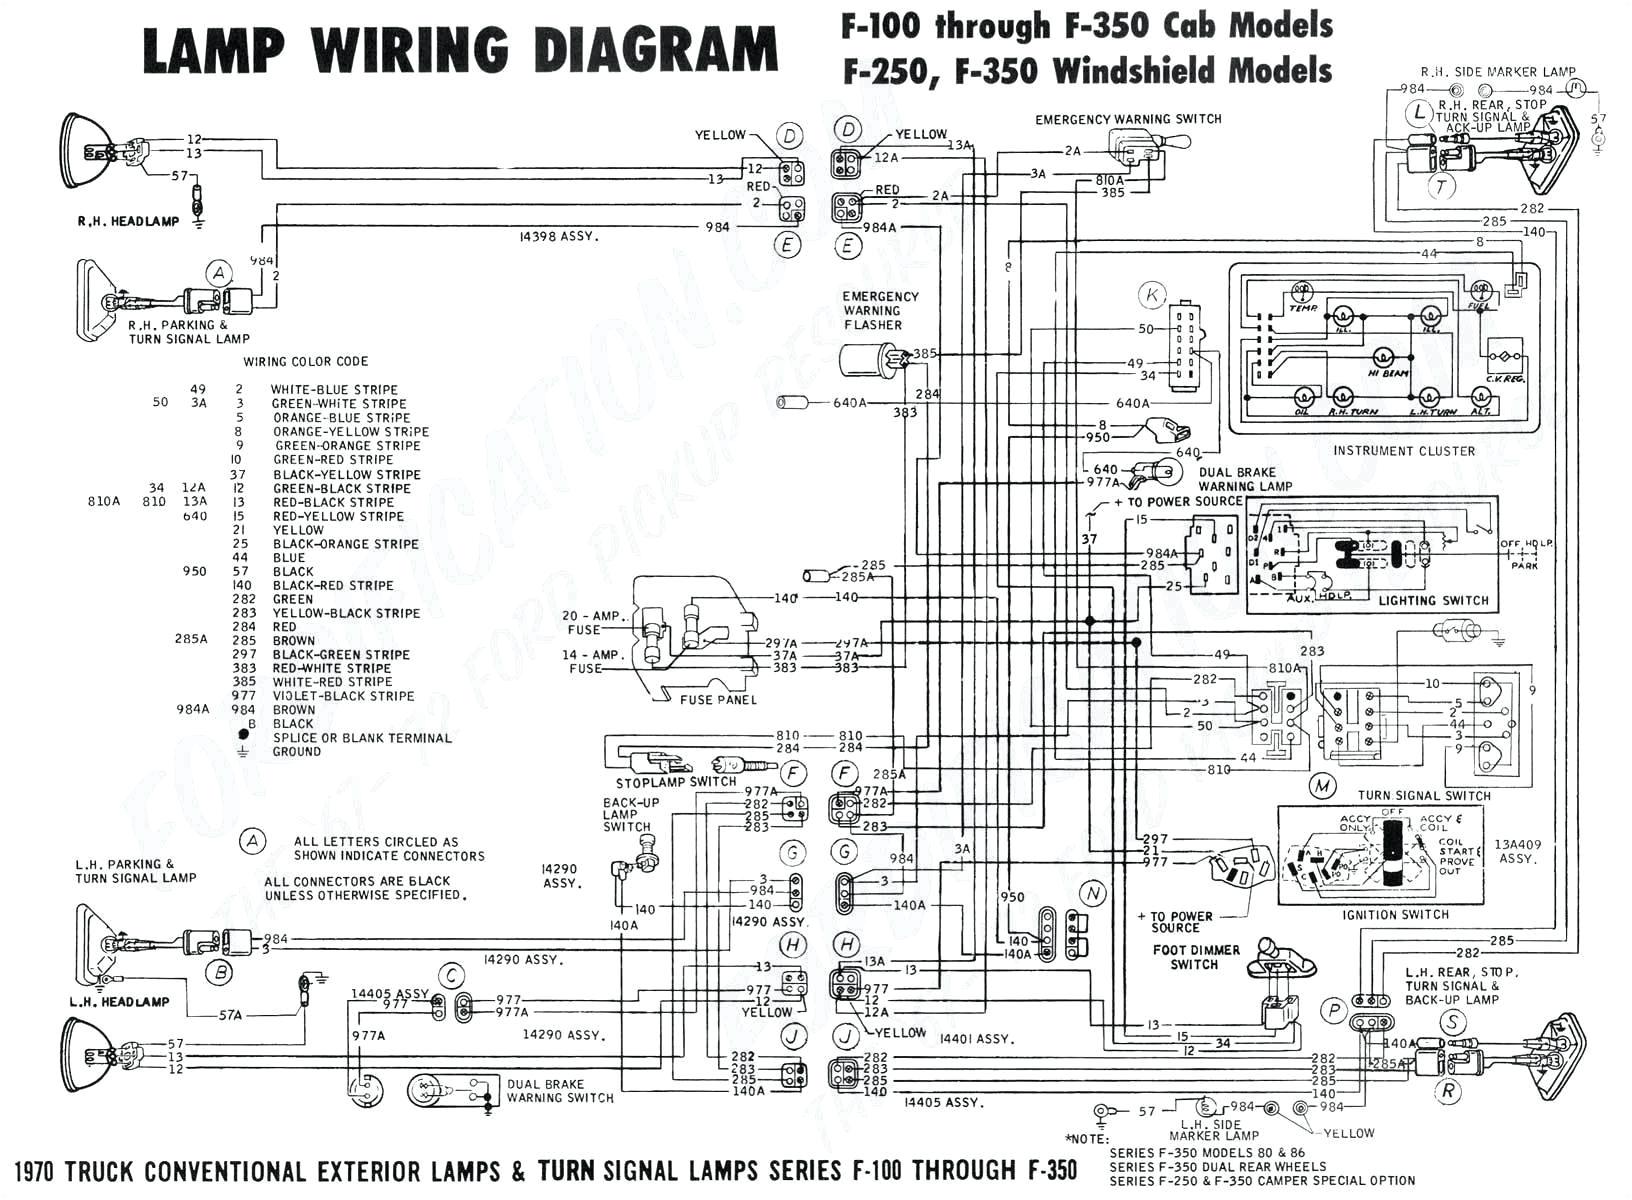 DIAGRAM] 1999 F350 Power Window Wiring Diagram FULL Version HD Quality Wiring  Diagram - ADAQUATEWIRING.ELIASVAPO.ITeliasvapo.it